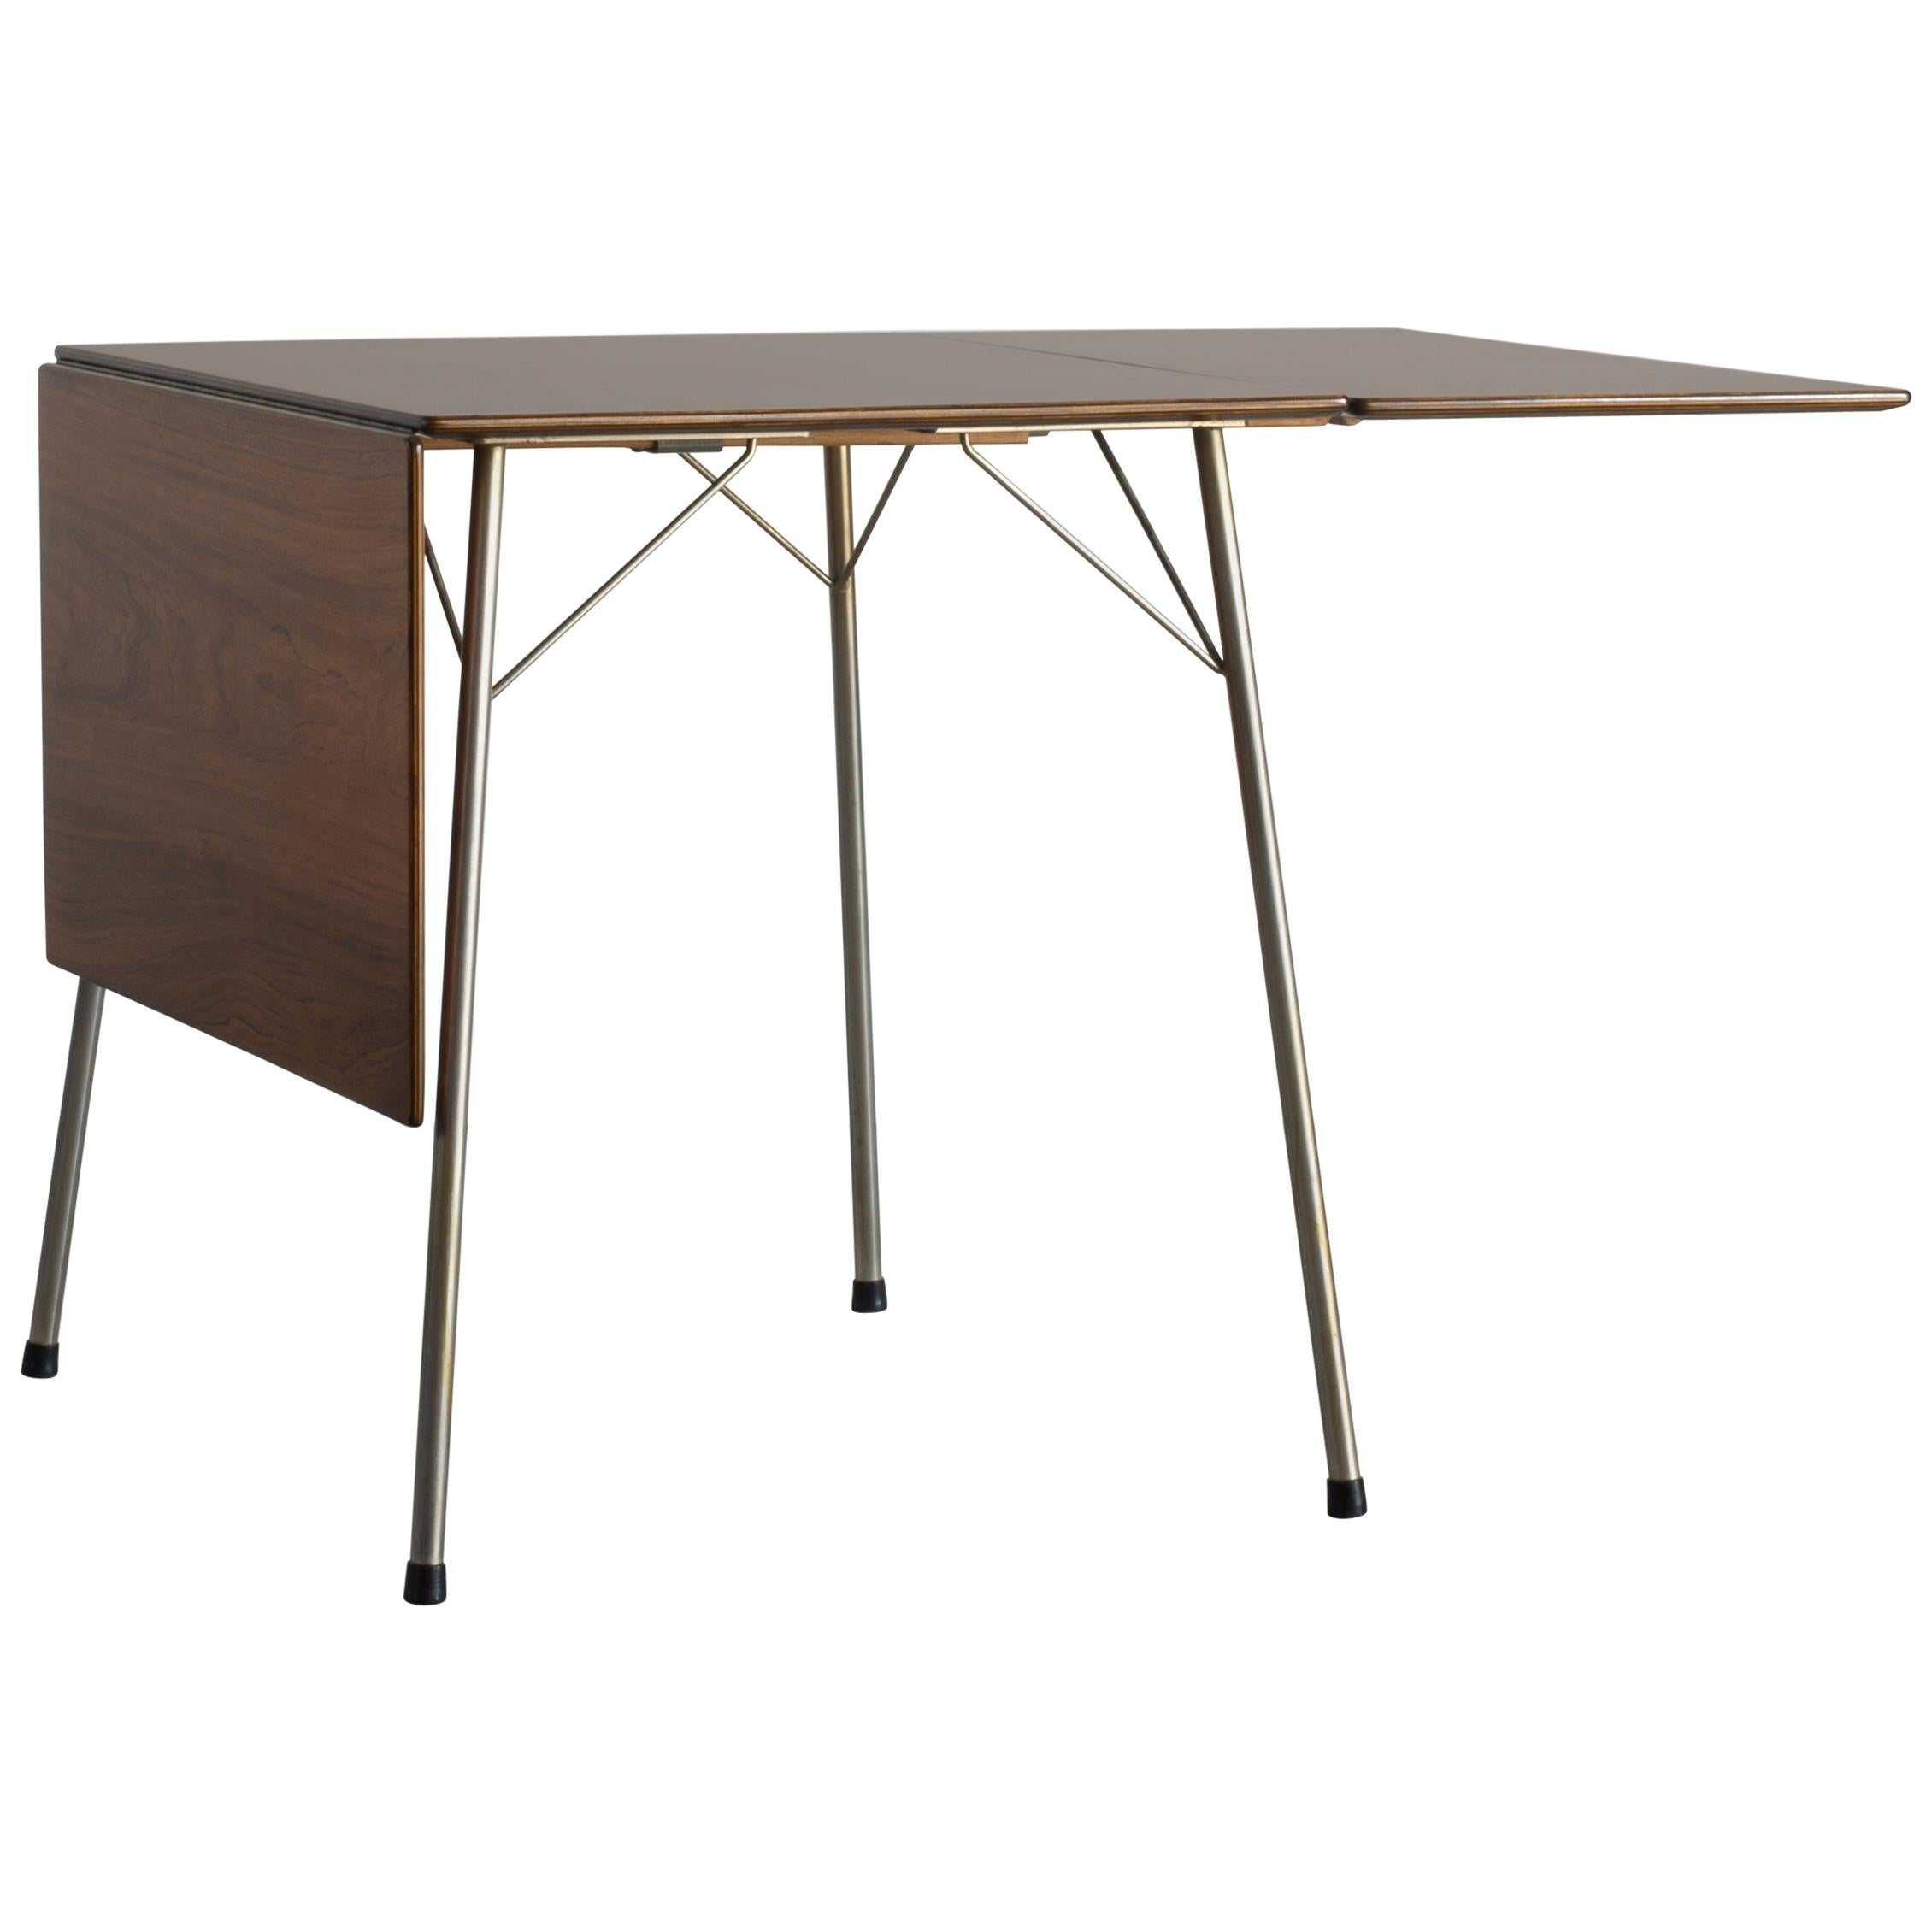 Arne Jacobsen Small Leaf Table in Rosewood for Fritz Hansen